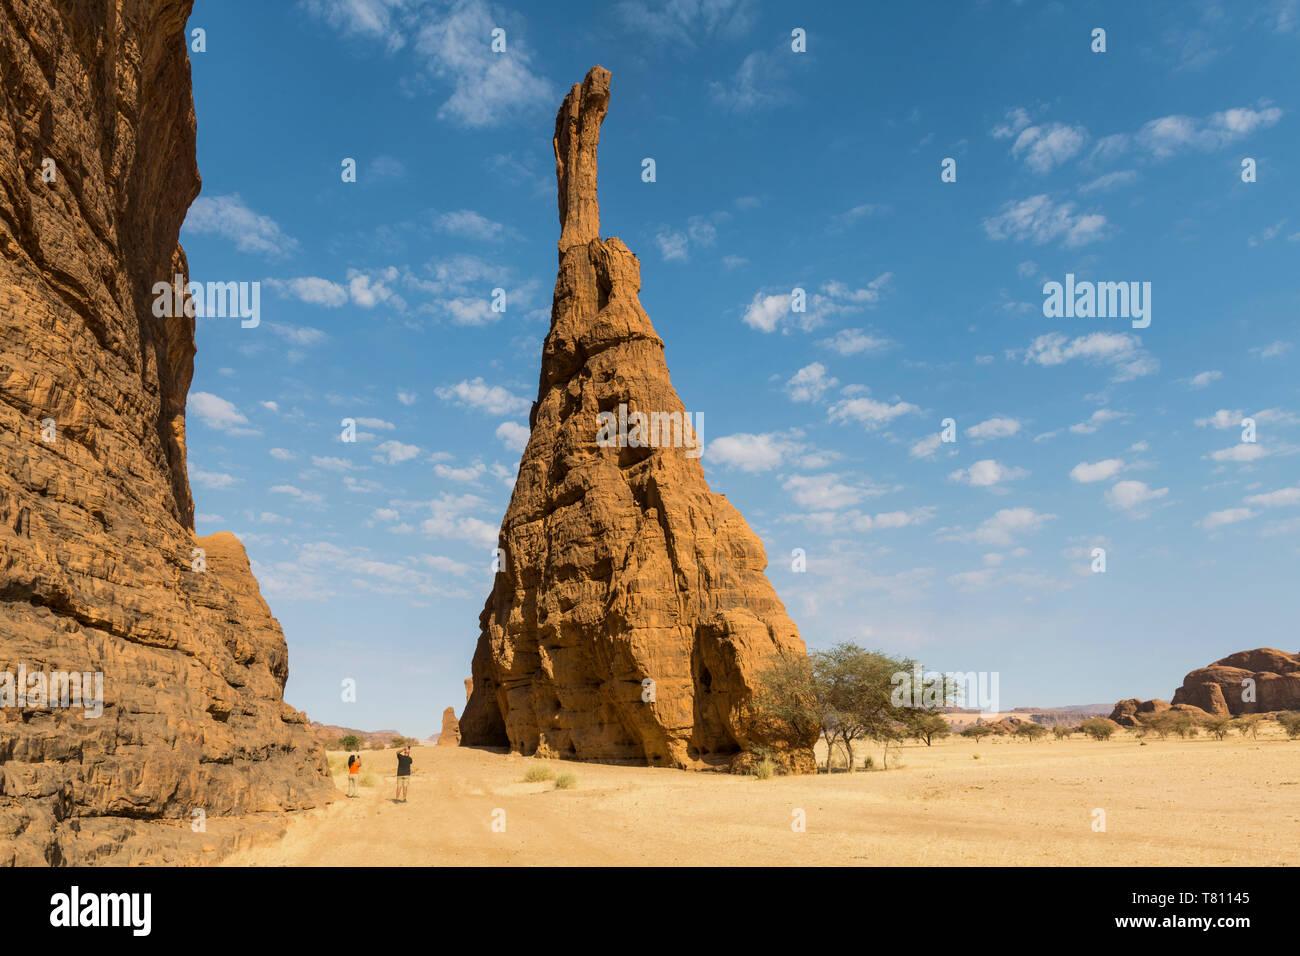 Massive single rock tower, Ennedi Plateau, UNESCO World Heritage Site, Ennedi region, Chad, Africa Stock Photo